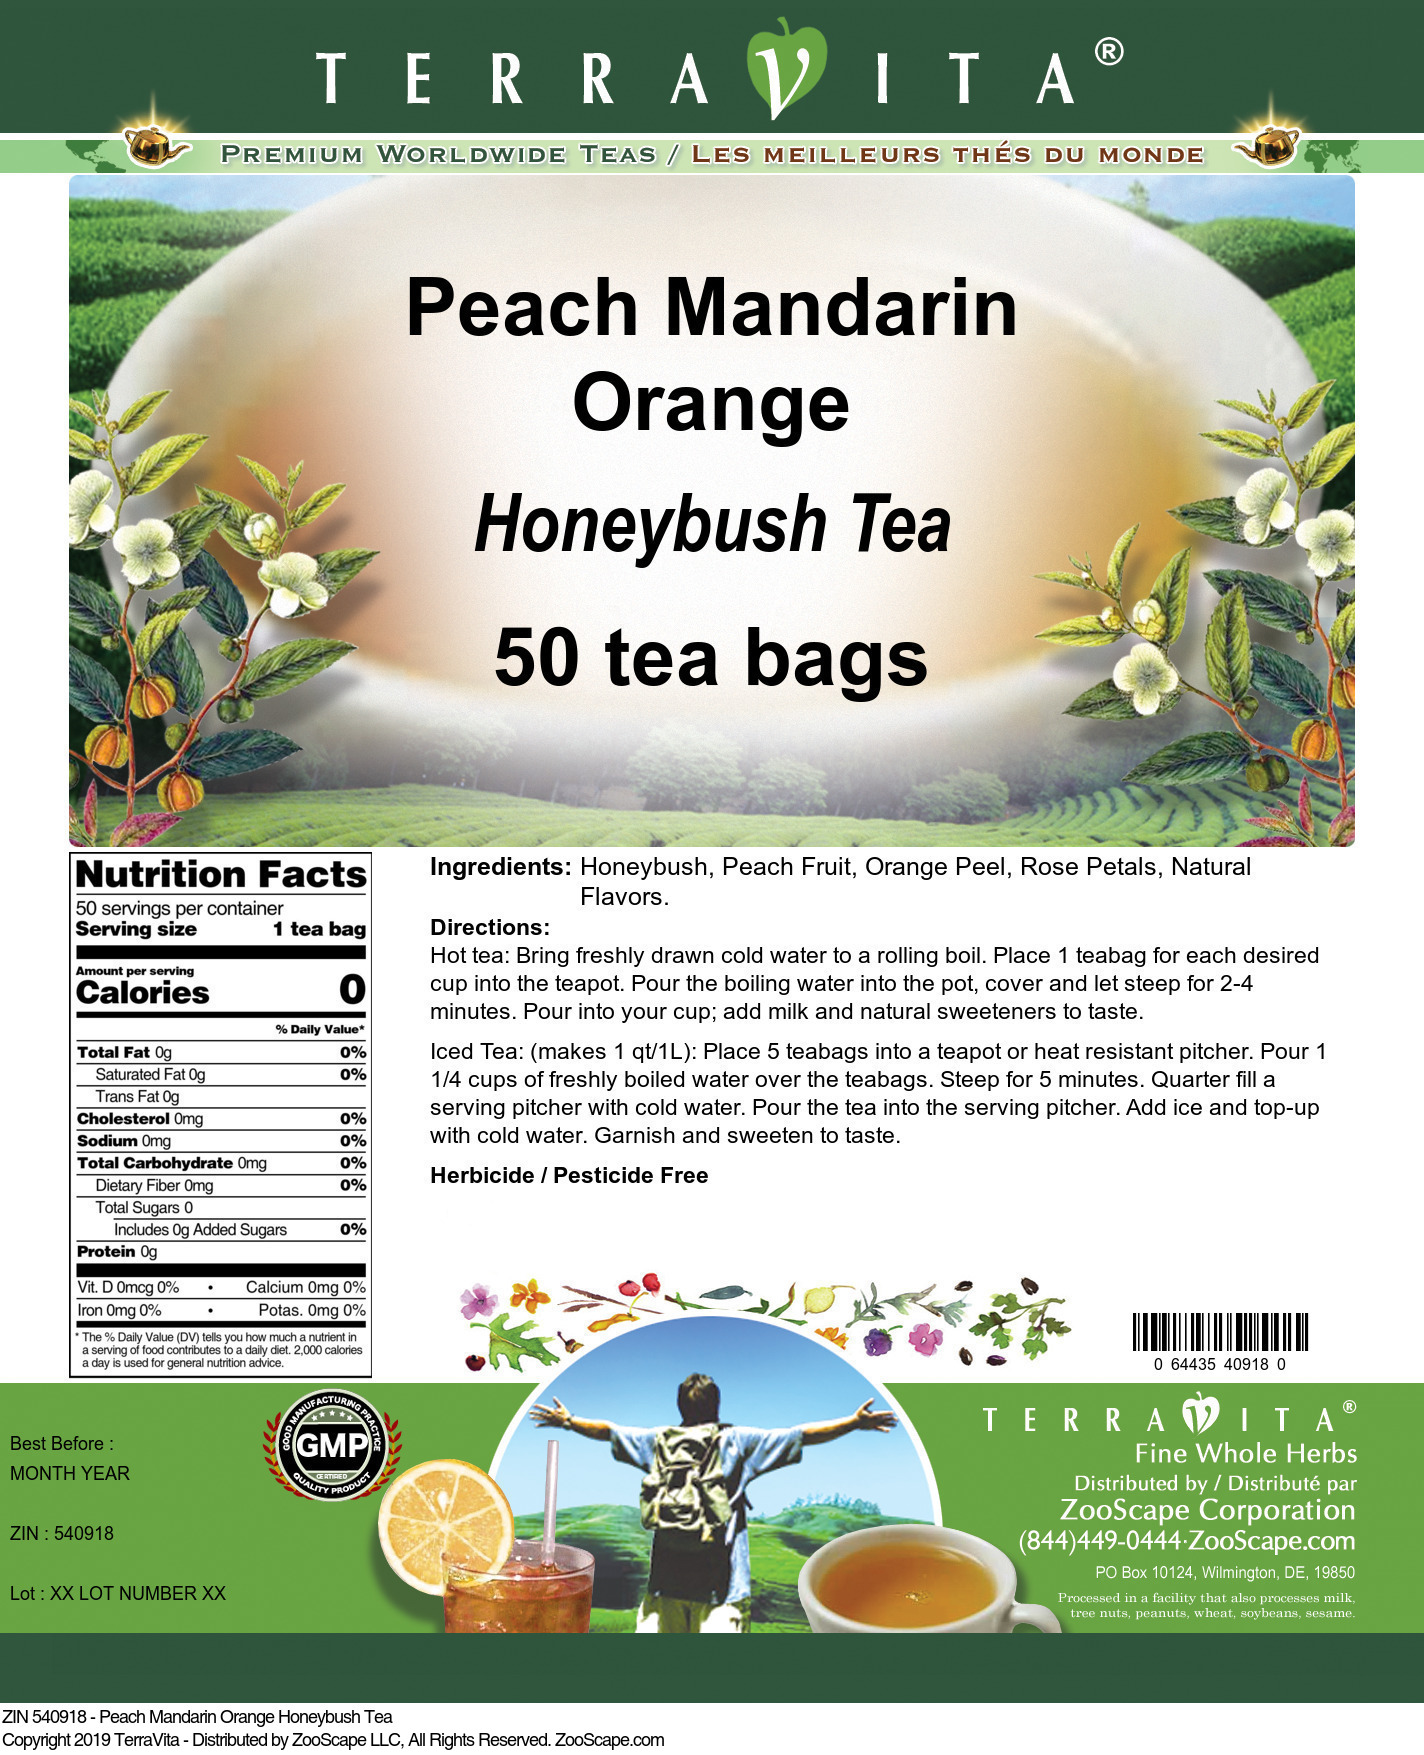 Peach Mandarin Orange Honeybush Tea